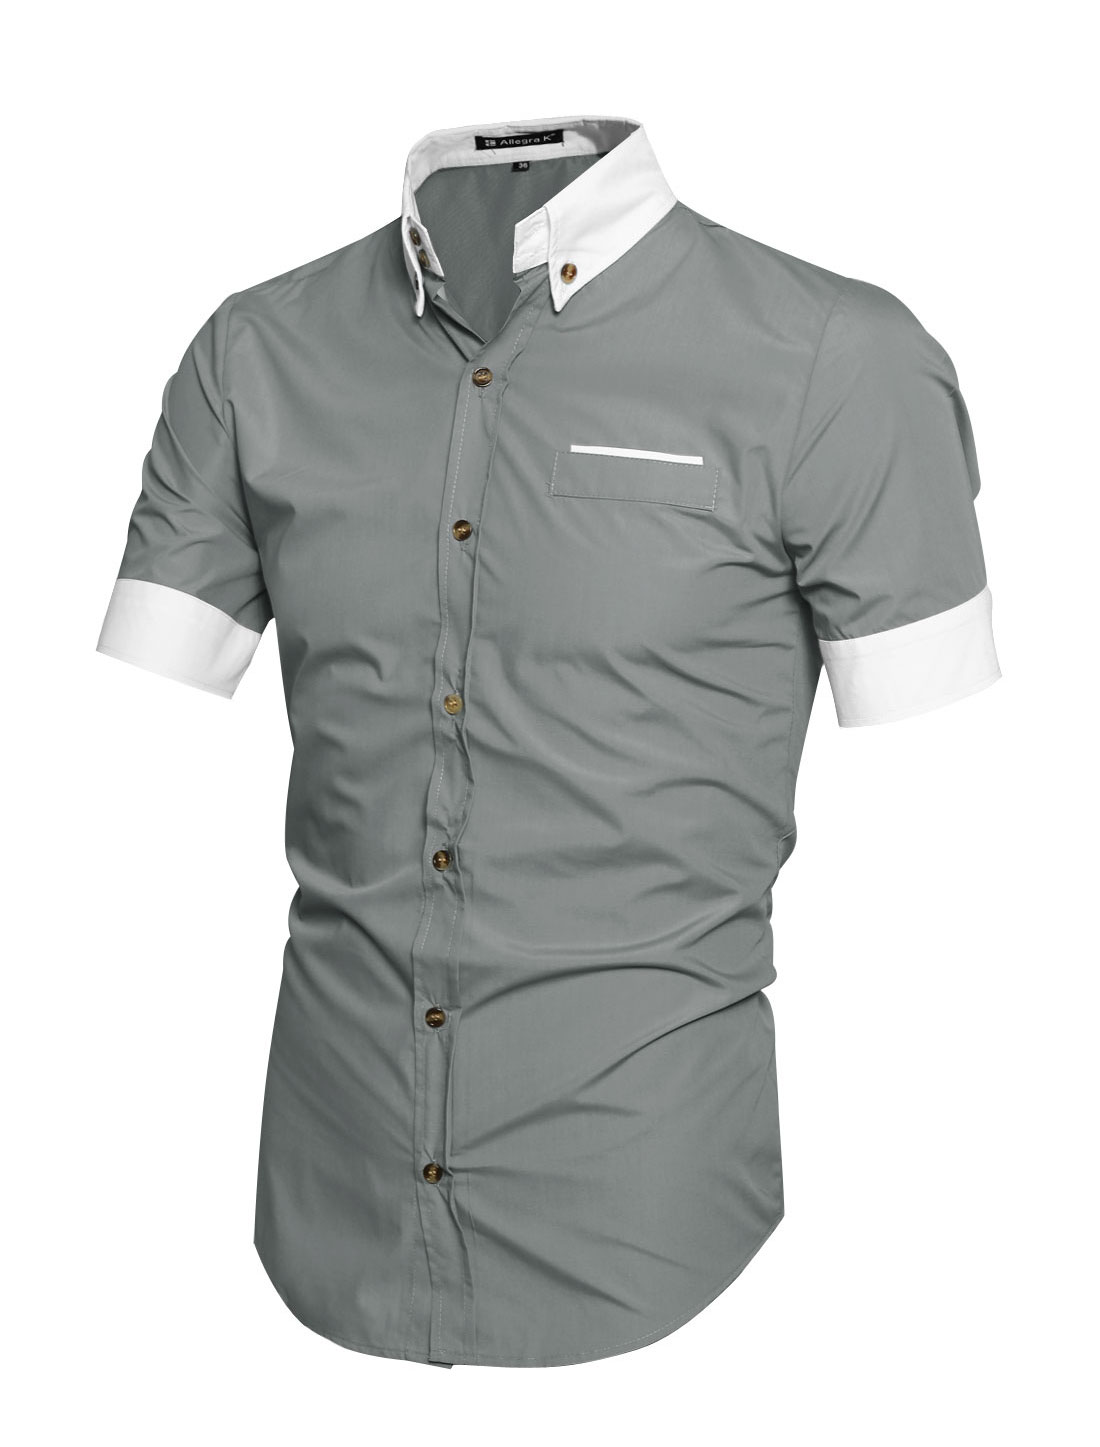 Men contrast color short sleeves button down shirt light for Best short sleeve button down shirts reddit